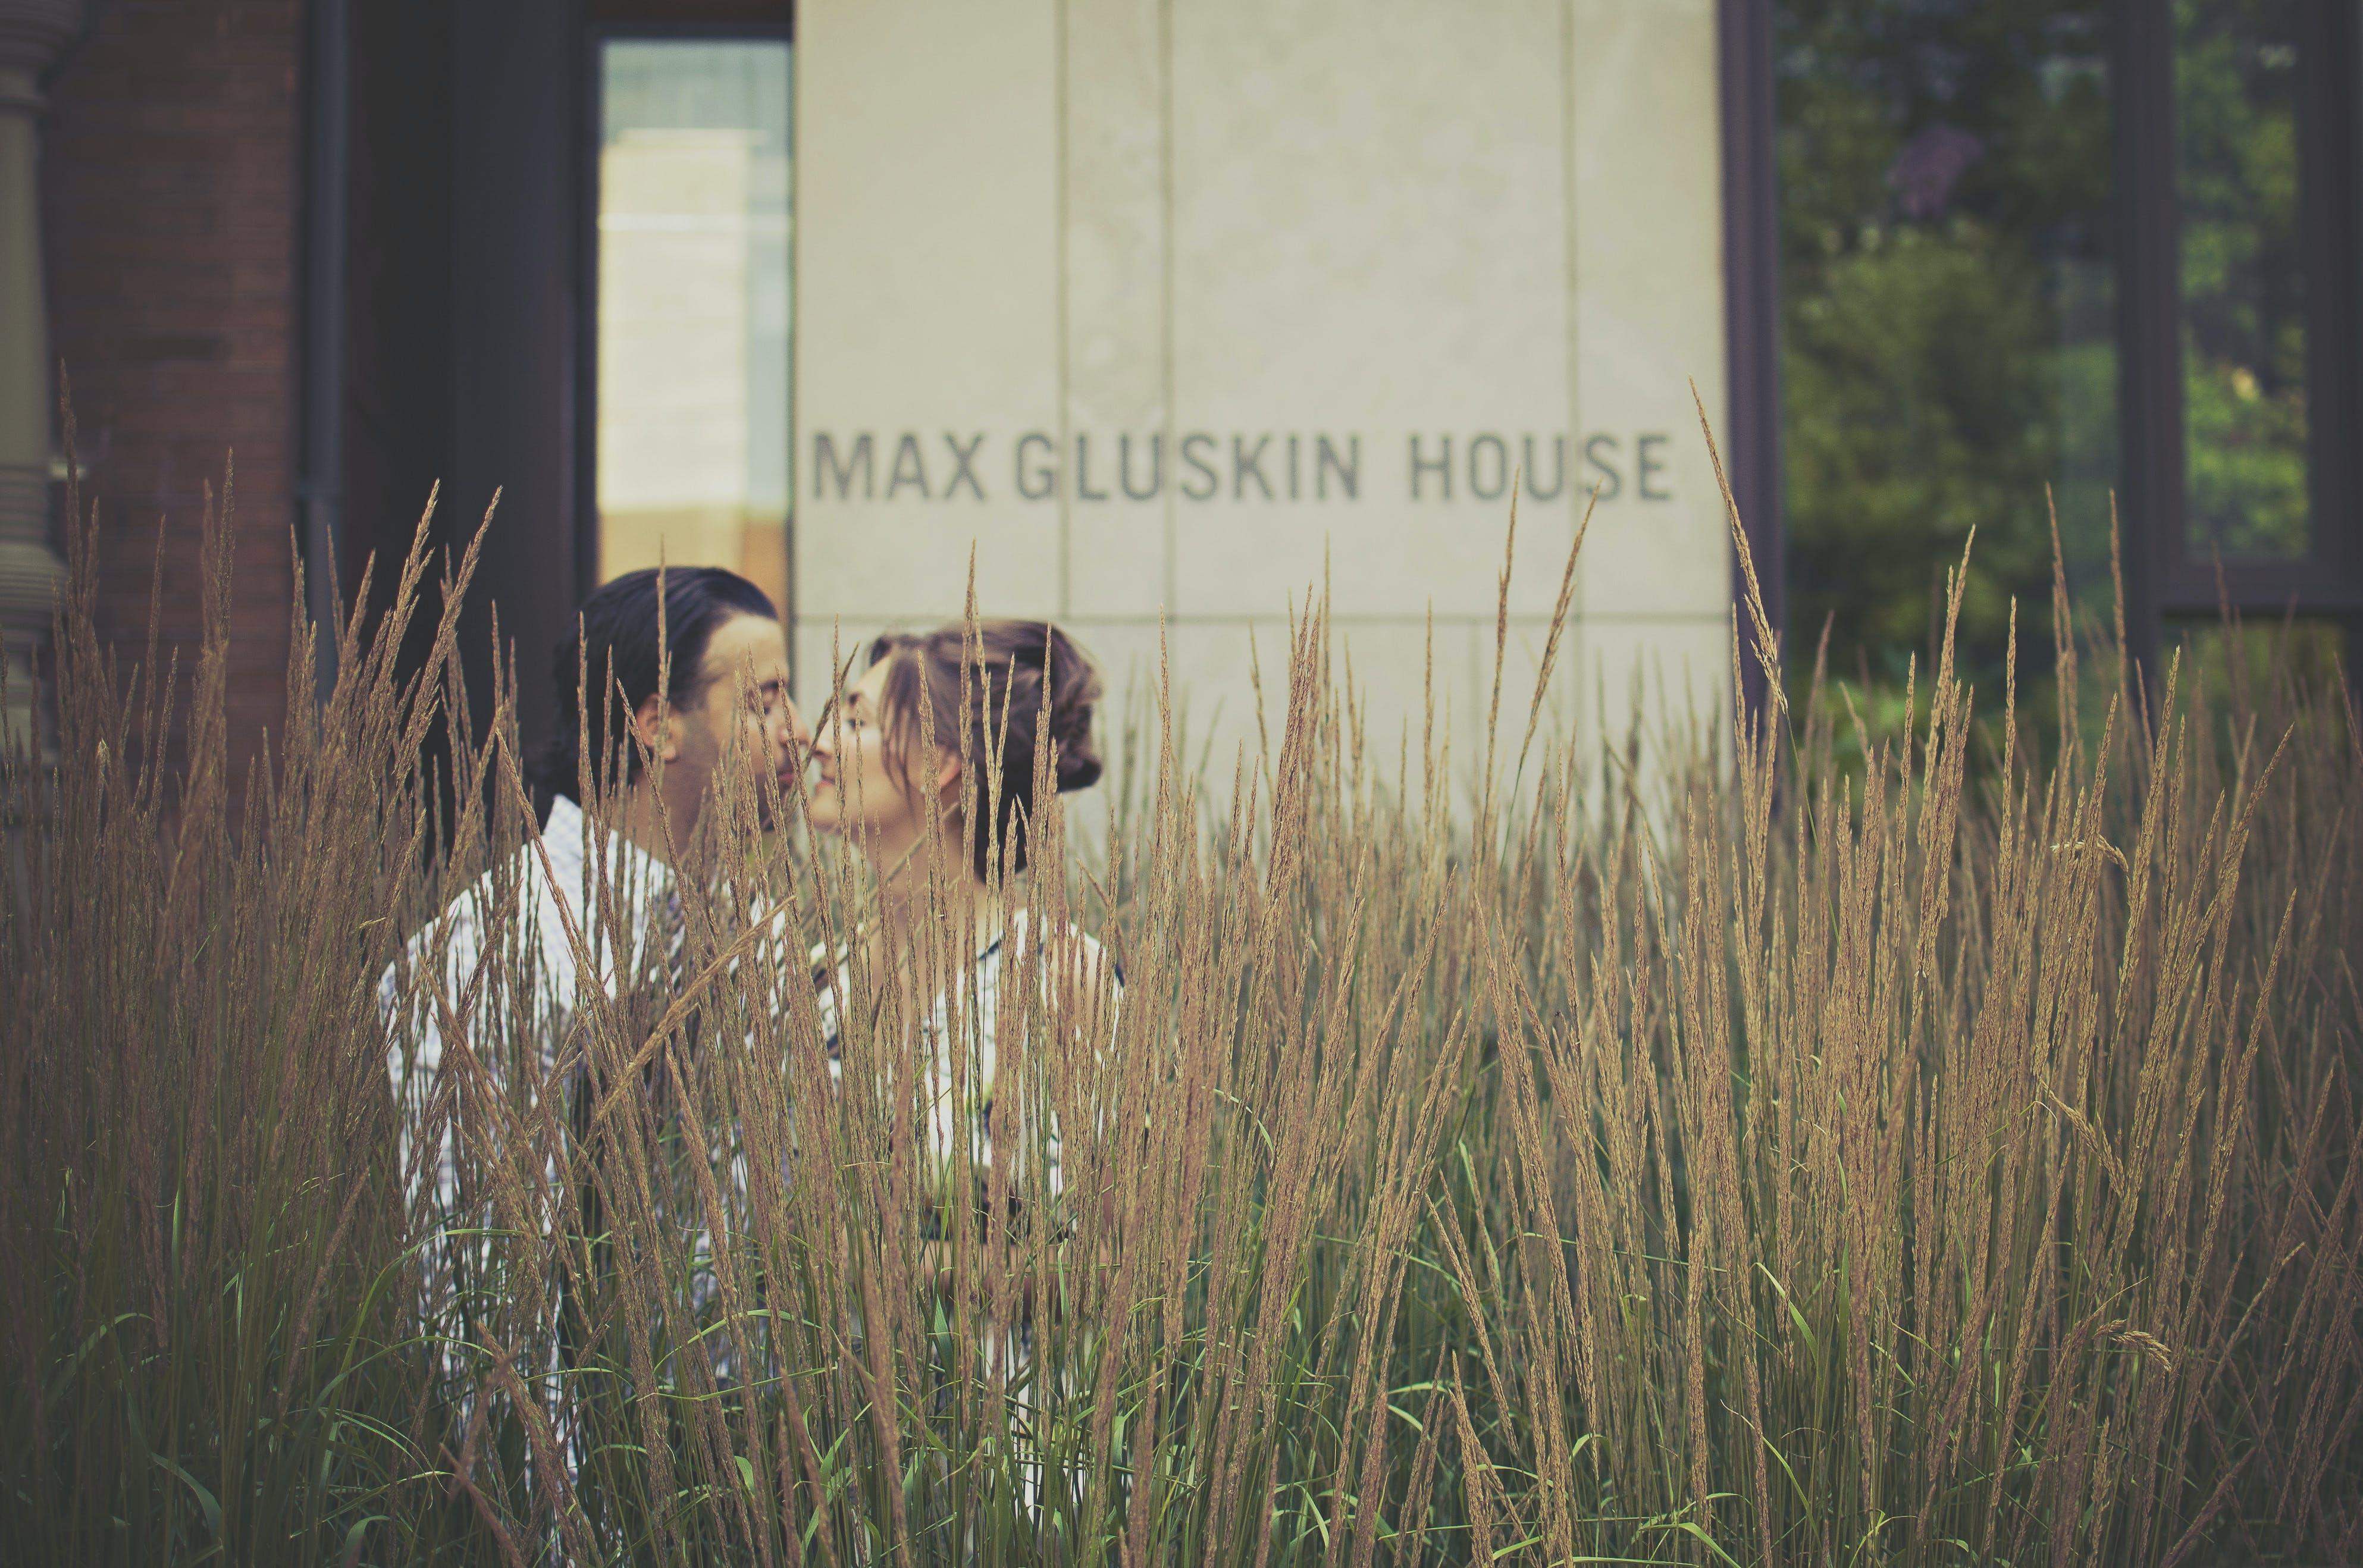 Man and Woman Kissing Near Green Plants